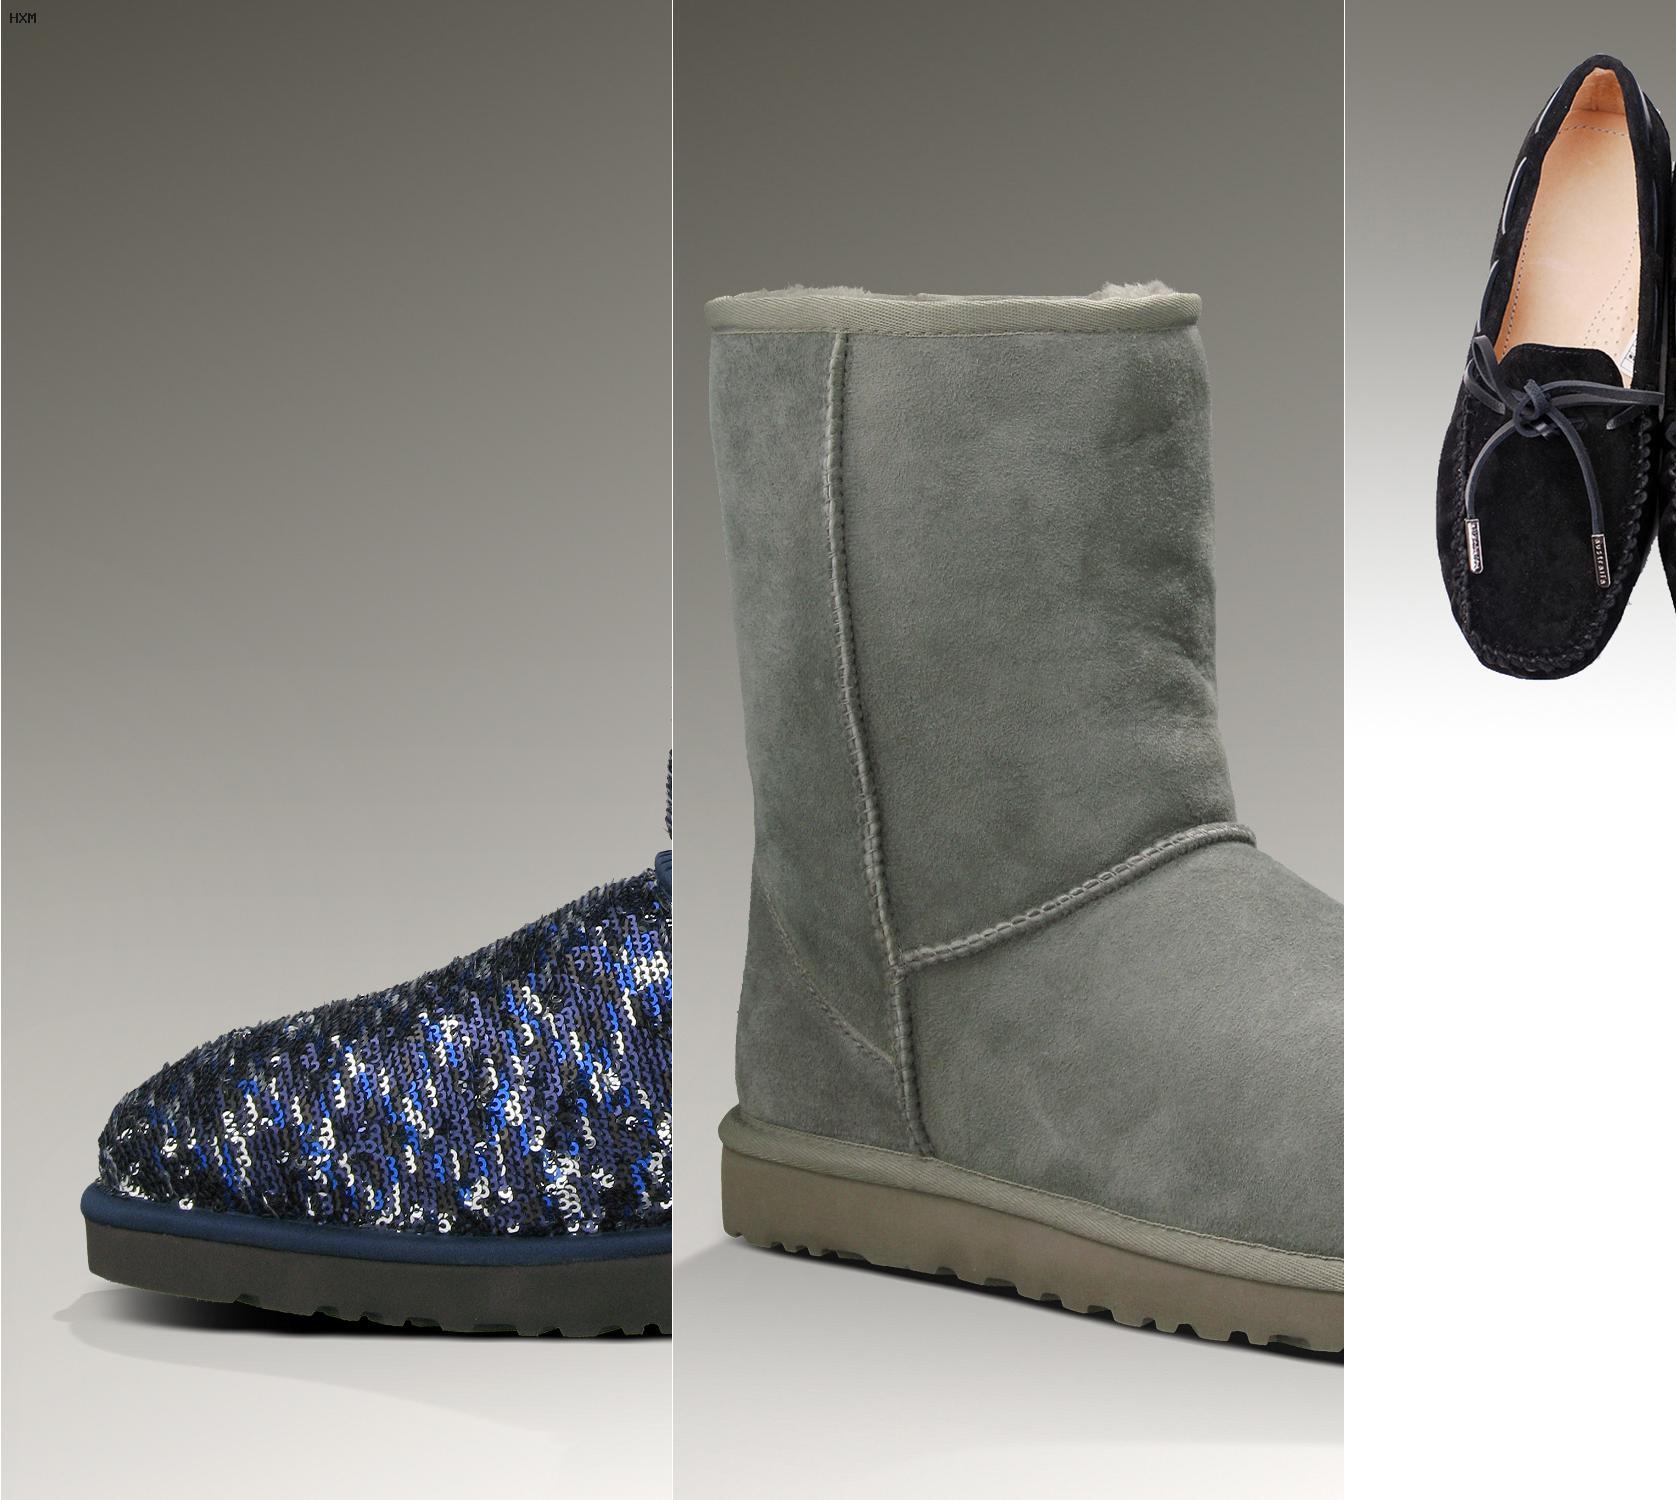 comprar botas ugg oferta